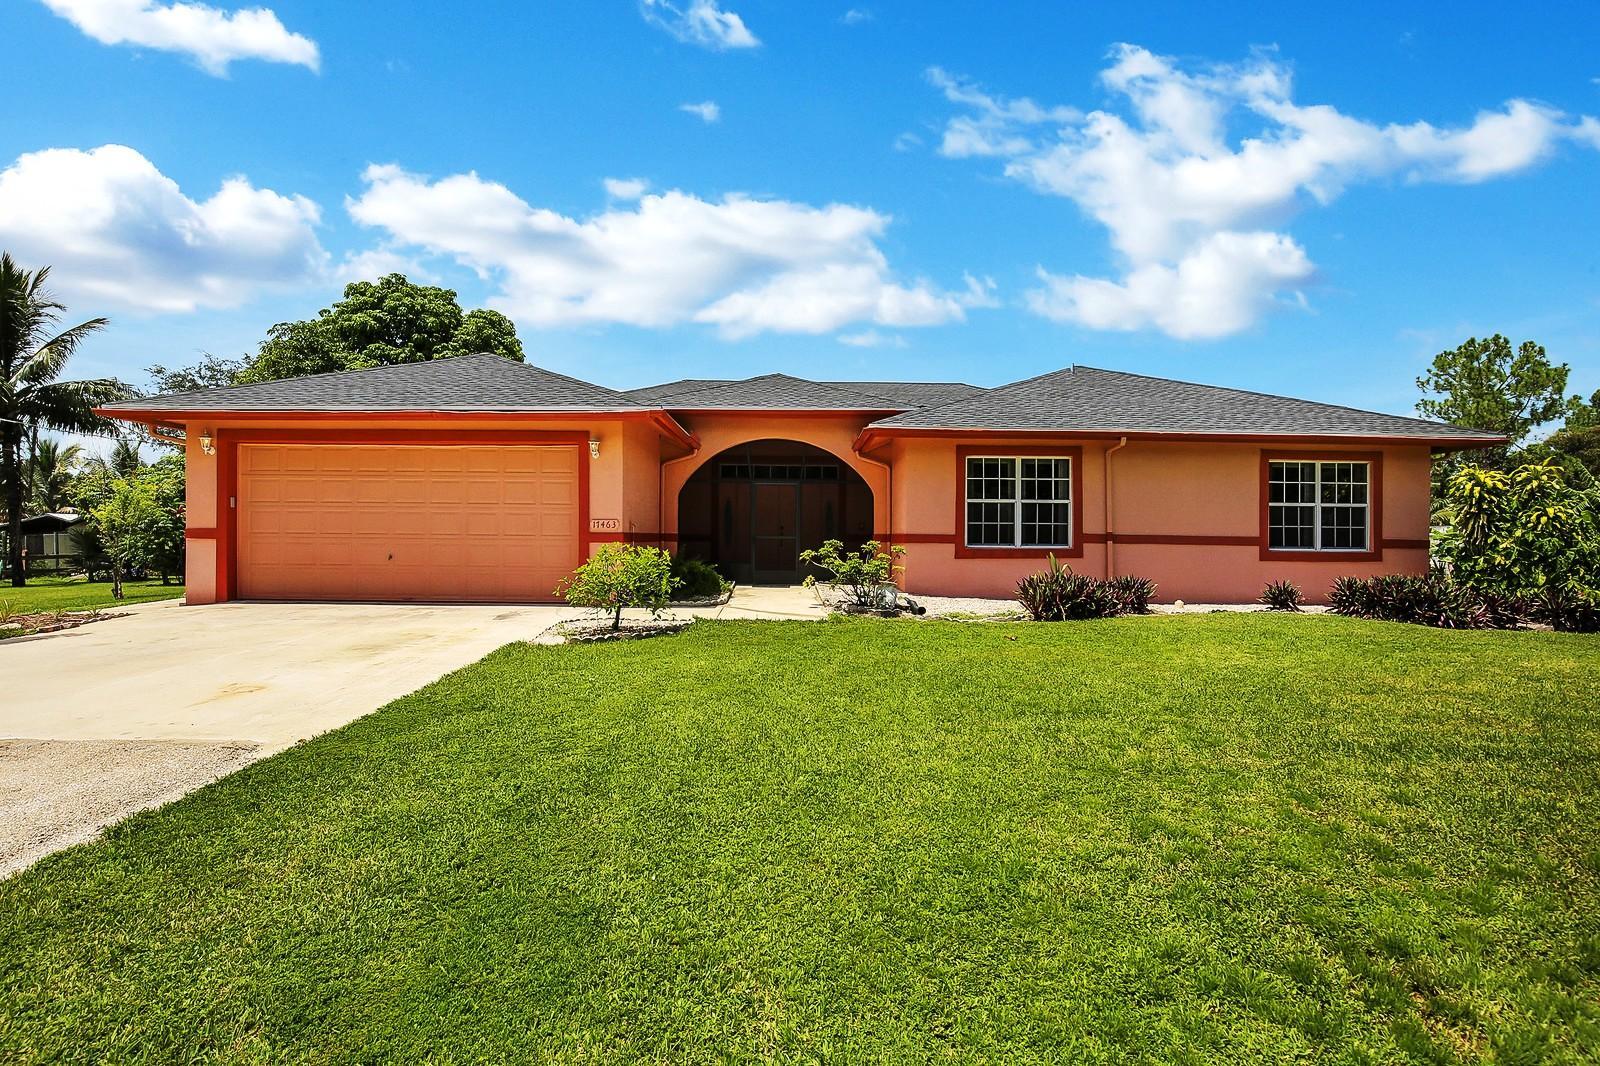 17463 31st Road, Loxahatchee, Florida 33470, 4 Bedrooms Bedrooms, ,3.1 BathroomsBathrooms,A,Single family,31st,RX-10450727